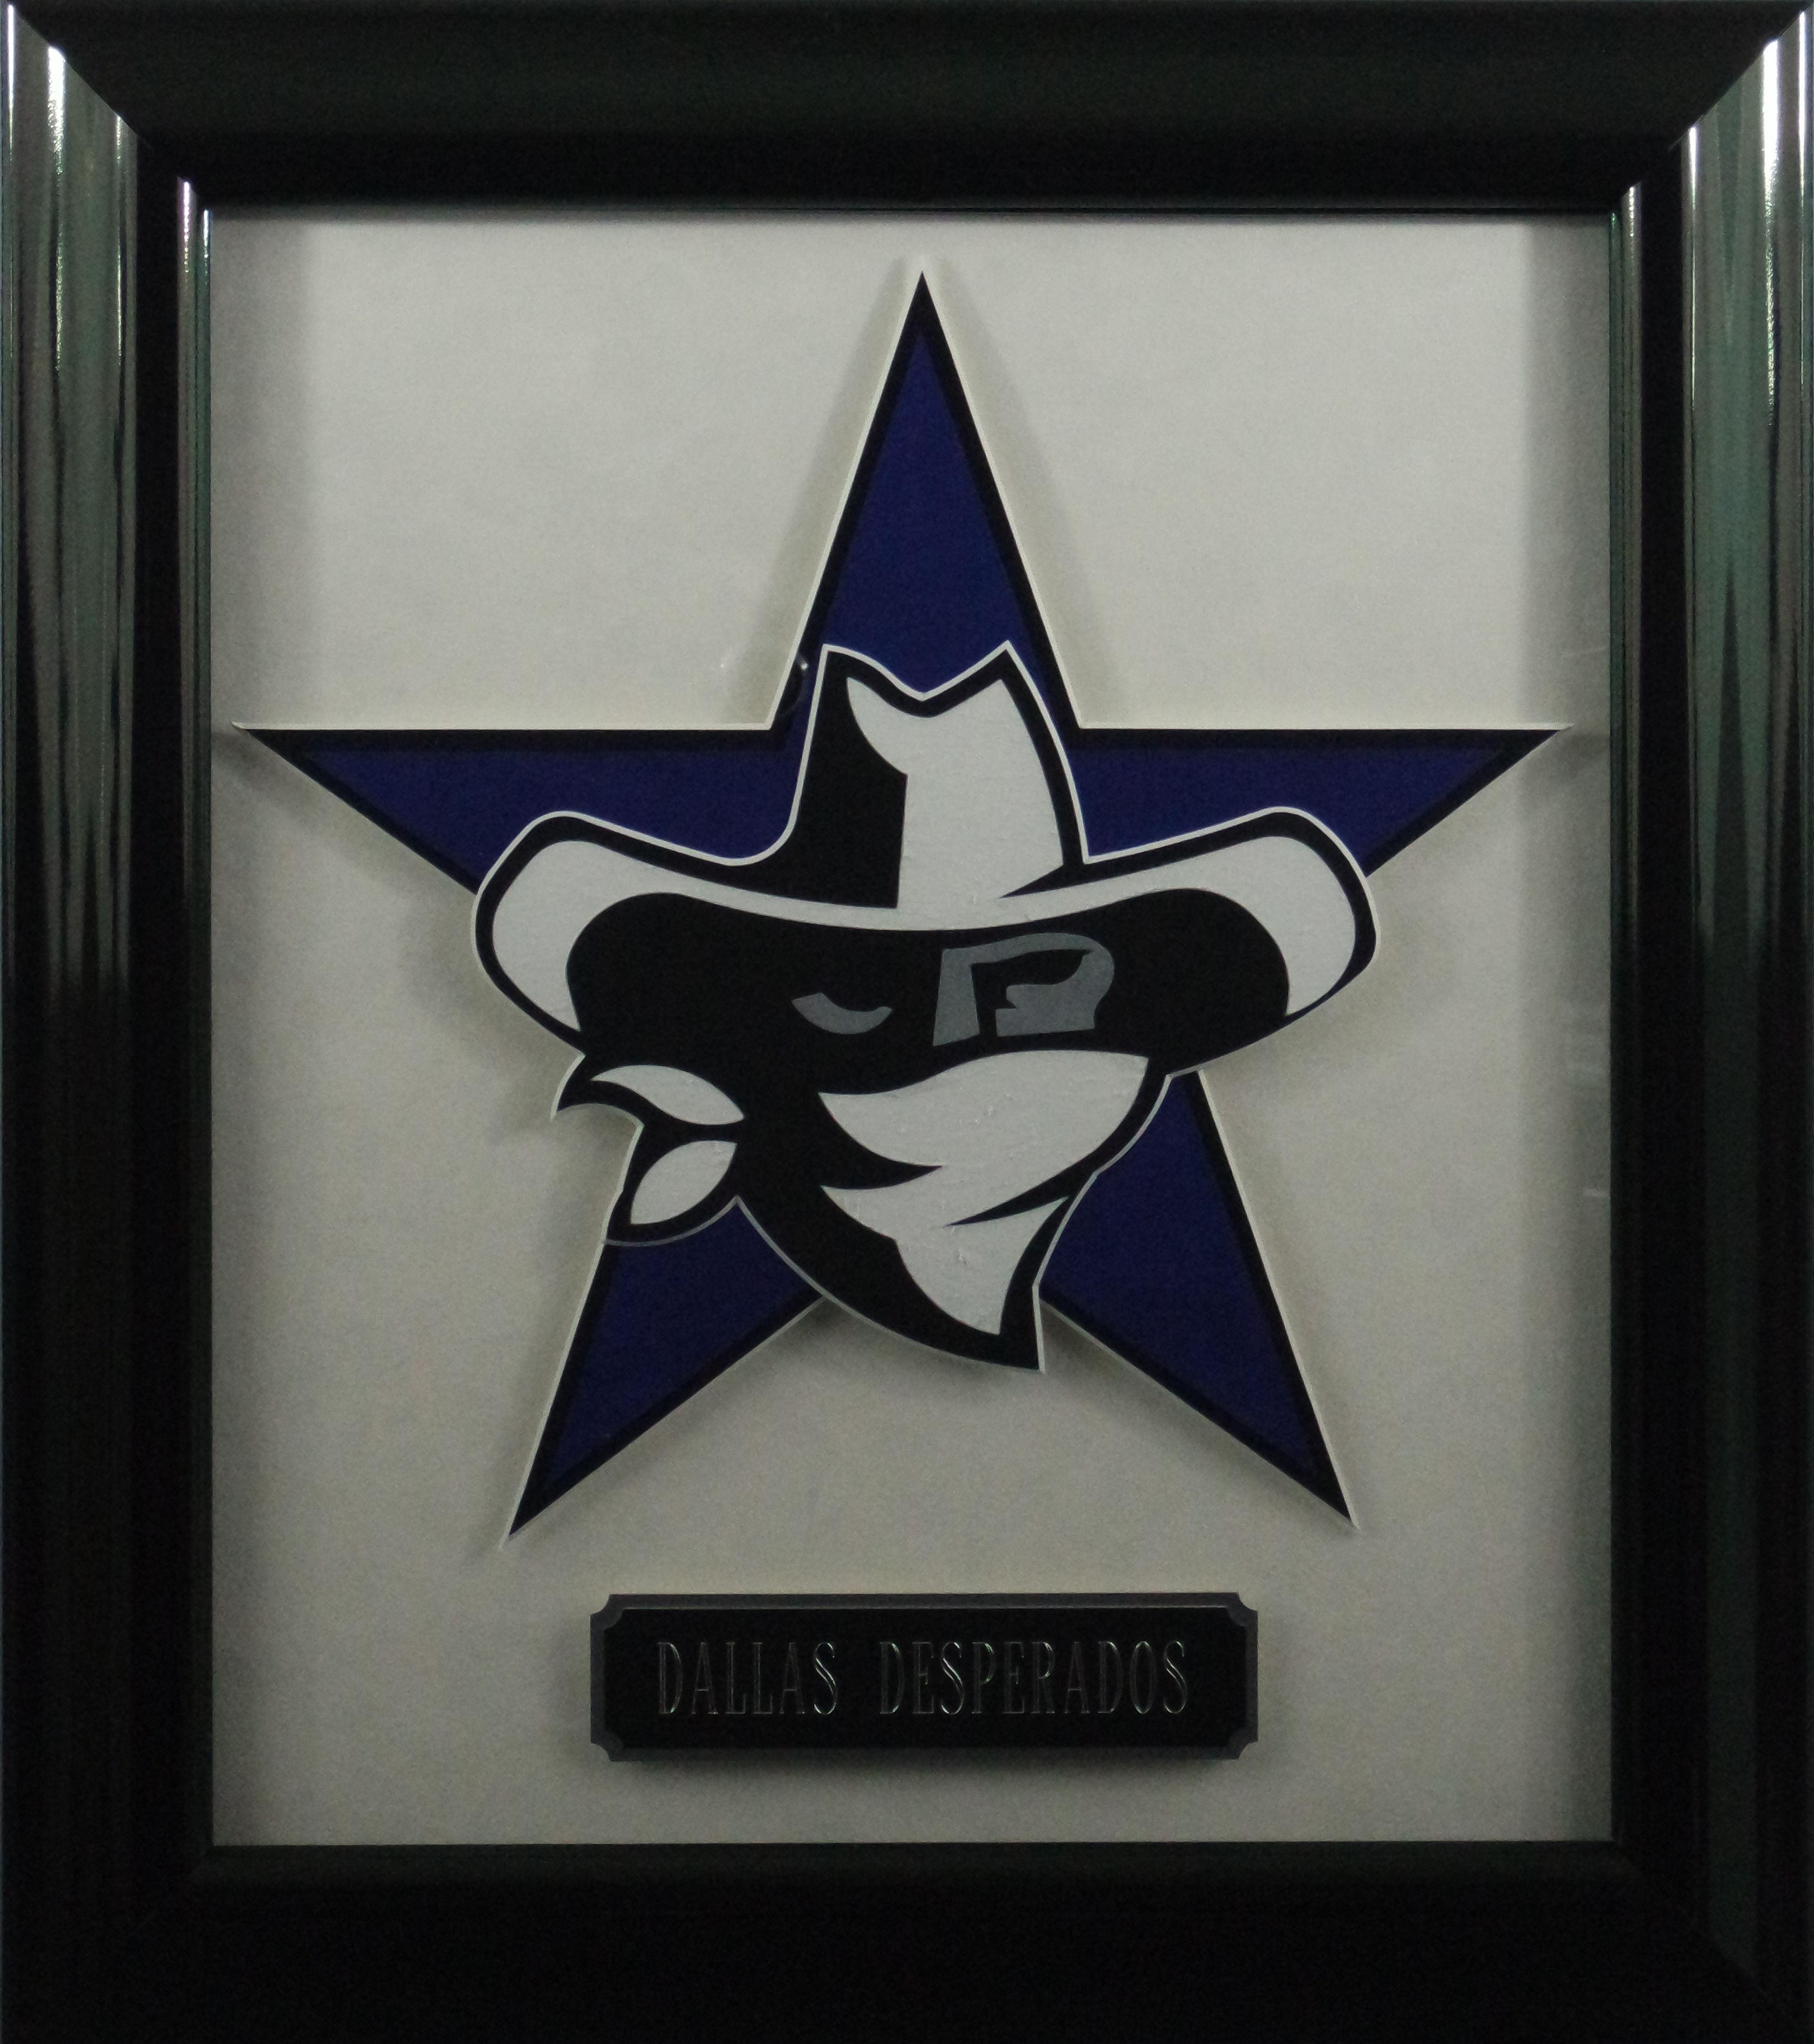 Dallas Desperados 3 Dimensional Hand Crafted Premium Logo Csd Memorabilia